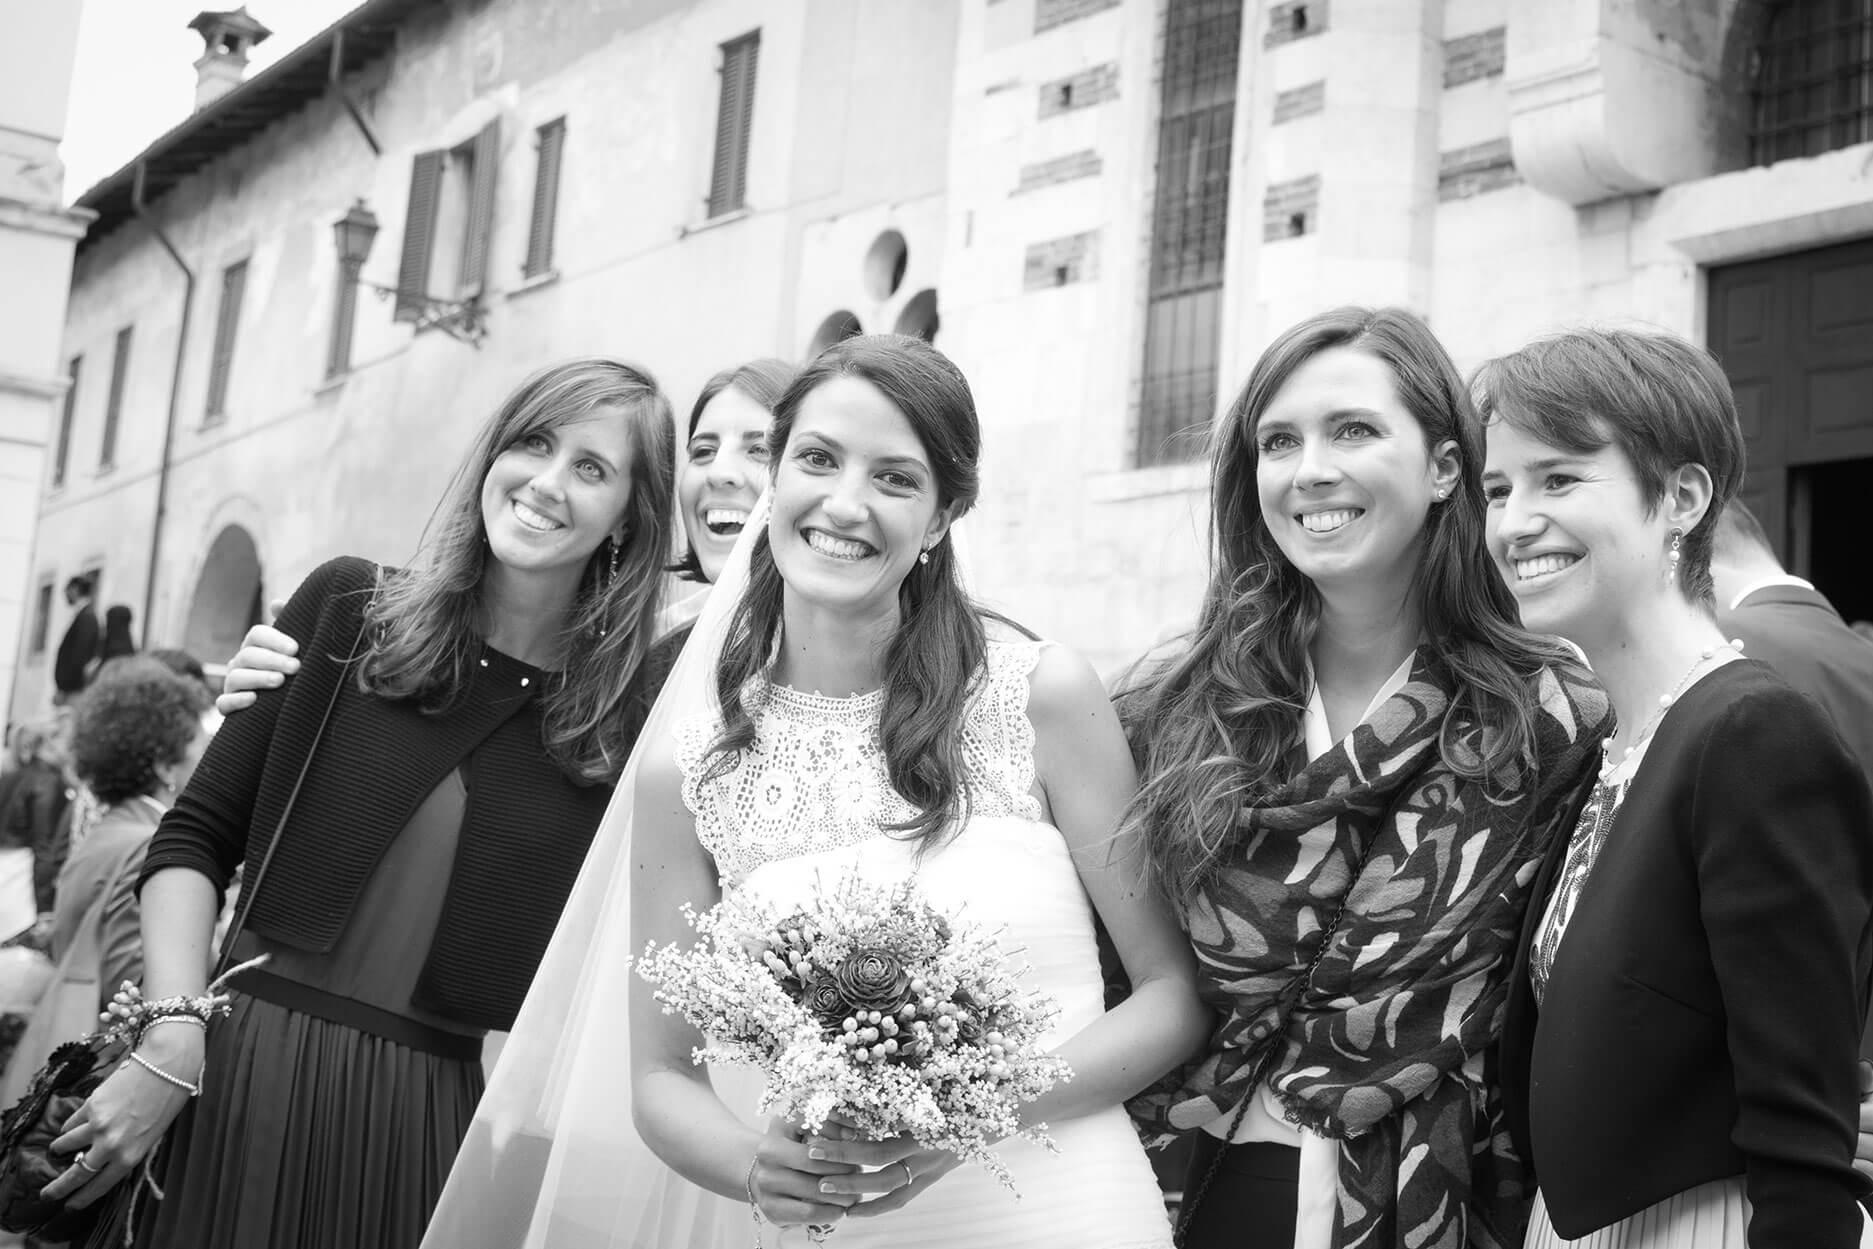 Francesca-Ferrati-WeddingIMG_0928